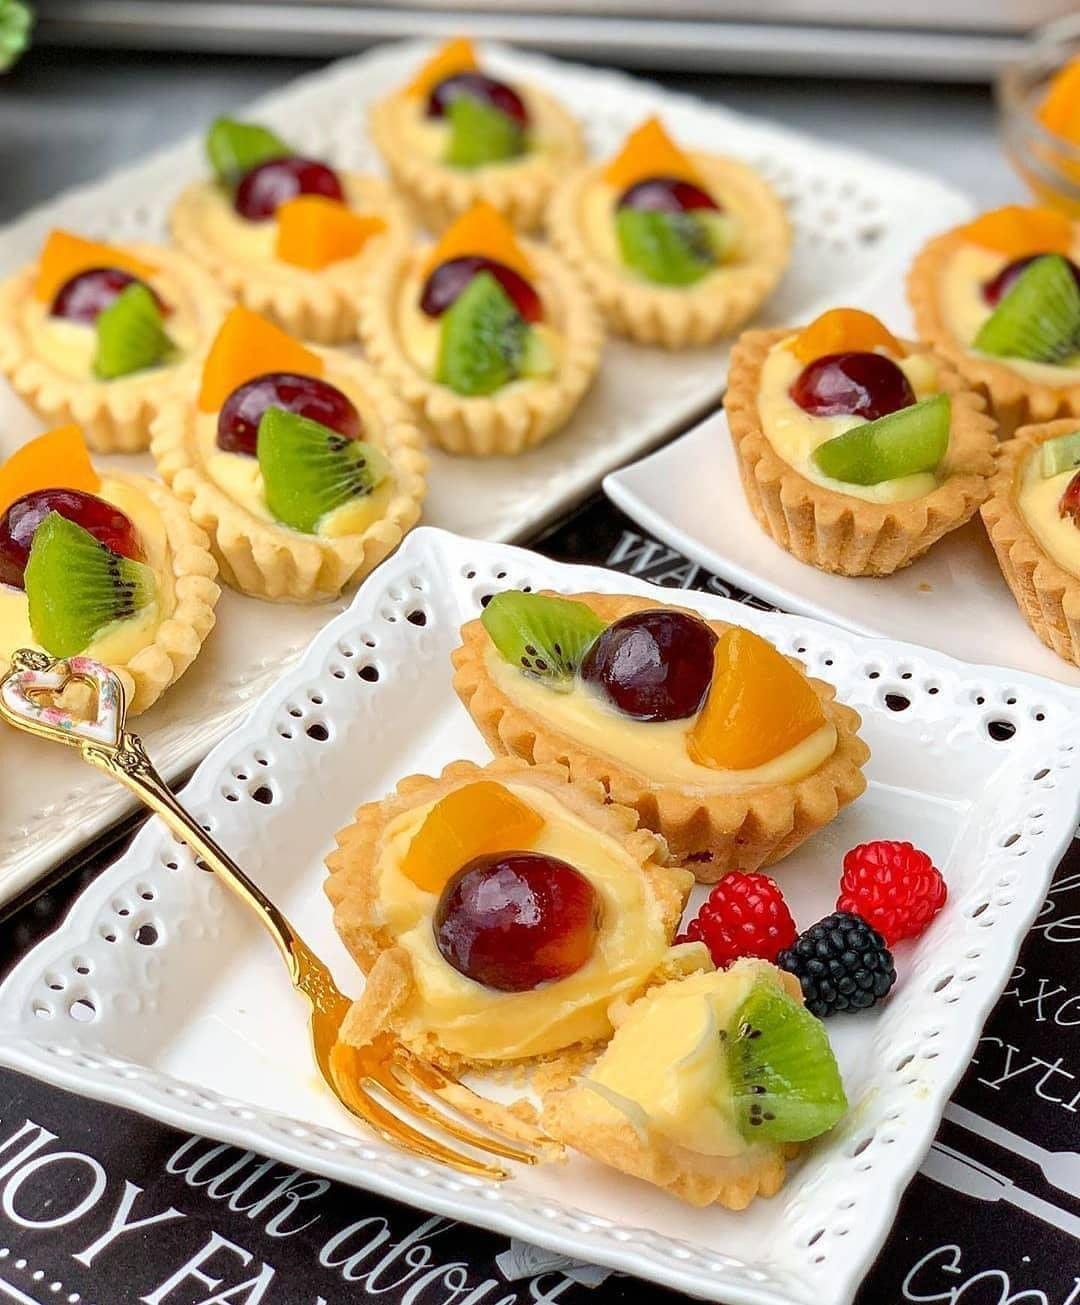 Resep Kue Pilihan Resepkuepilihan Posted On Instagram Fruit Pie By Vitakwee Bahan Kulit Ncc Fruit Tart Recipe Easy Easy Tart Recipes Fruit Tart Recipe